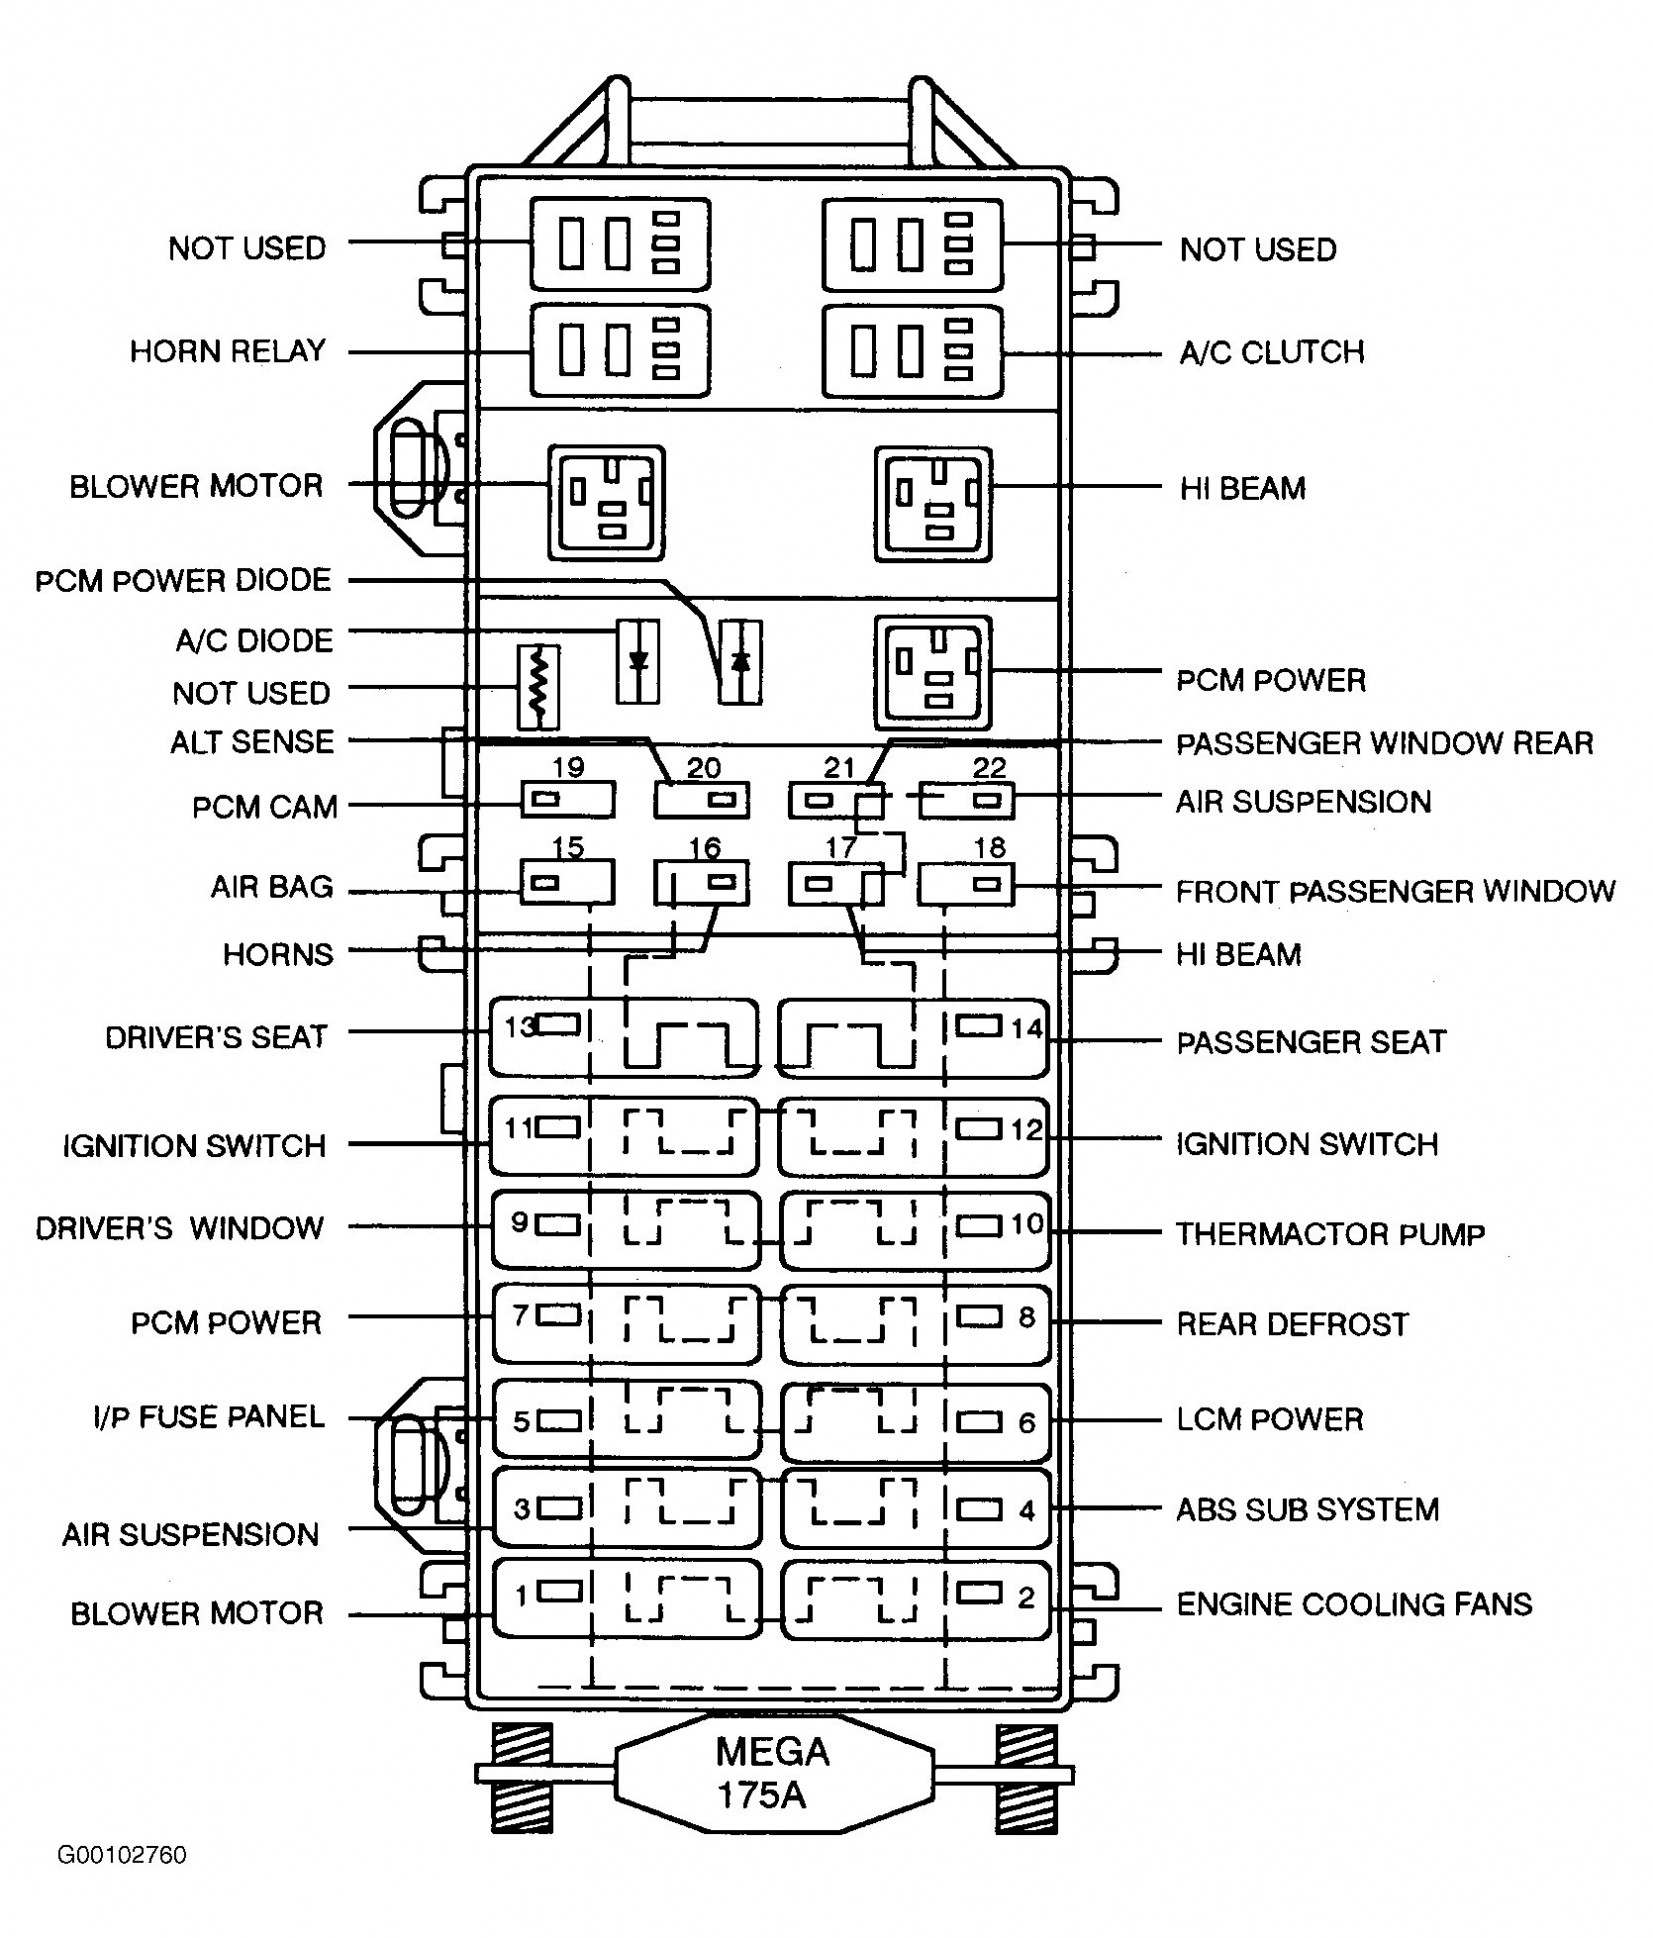 2001 Lincoln town Car Fuse Box Diagram 2001 Lincoln town Car Fuse Box Diagram — Daytonva150